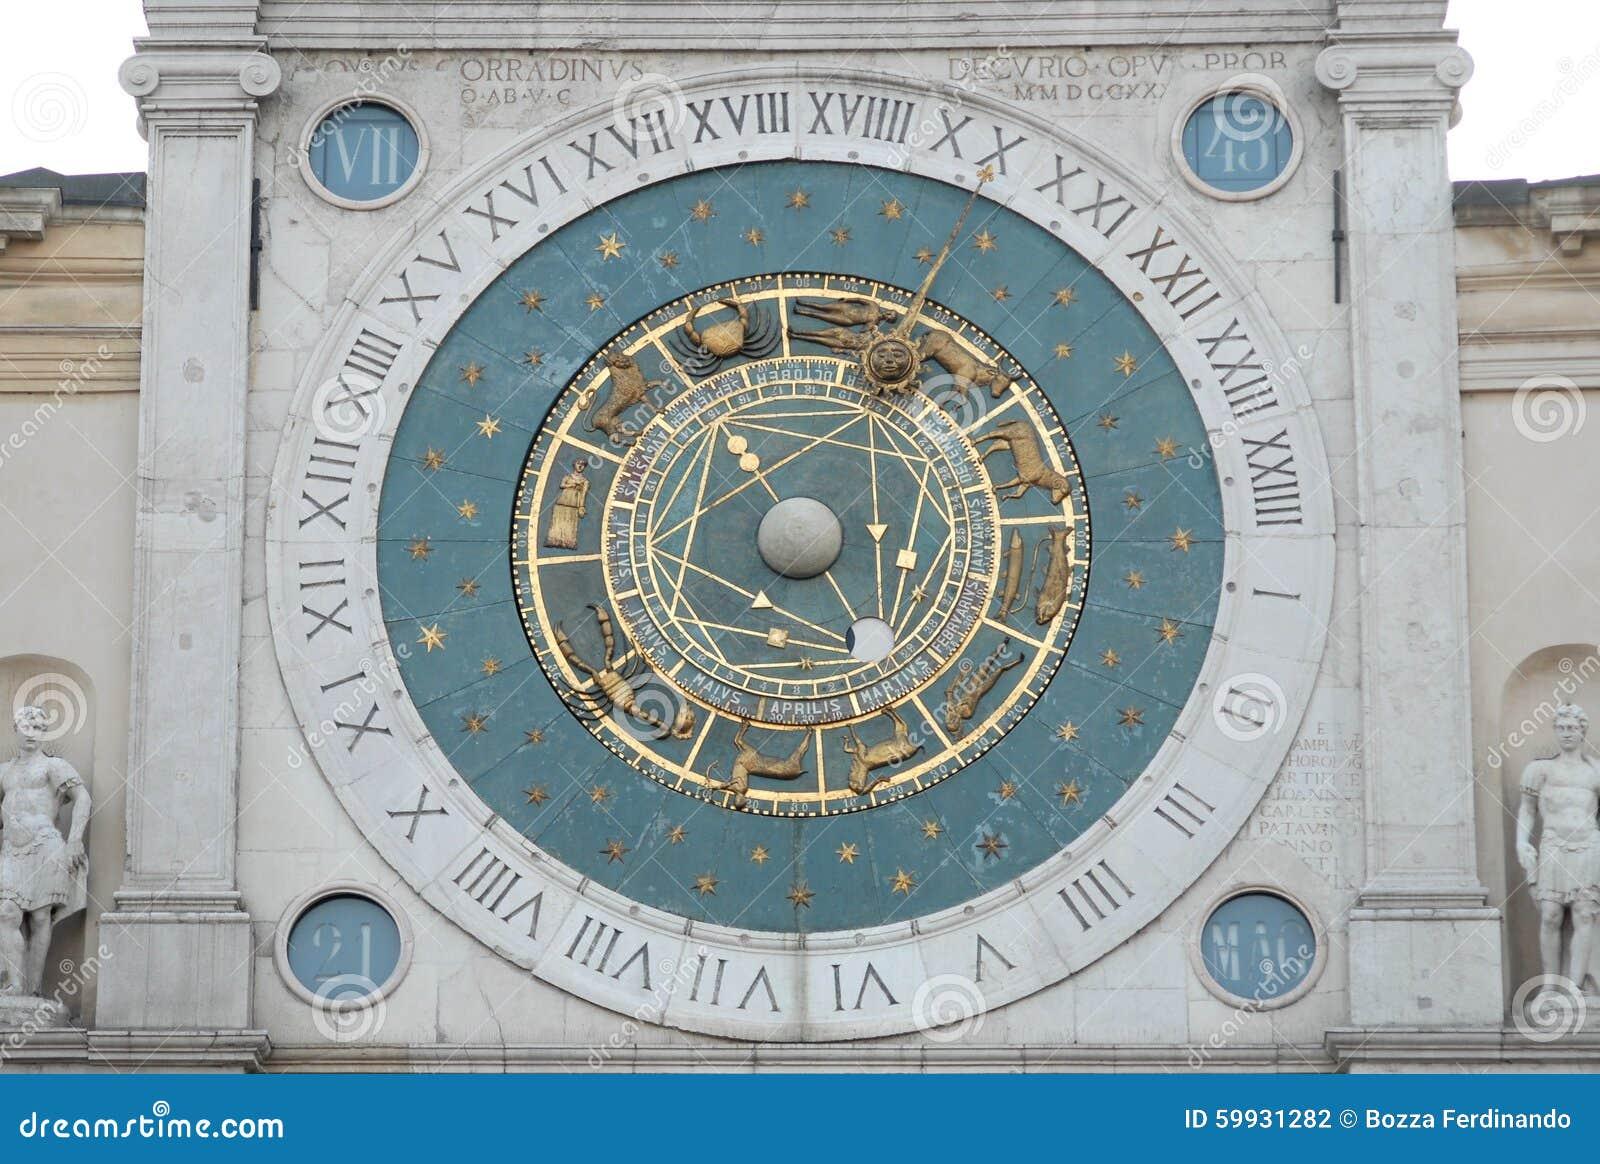 Big clock in Piazza dei Signori in Padua in the Veneto (Italy)